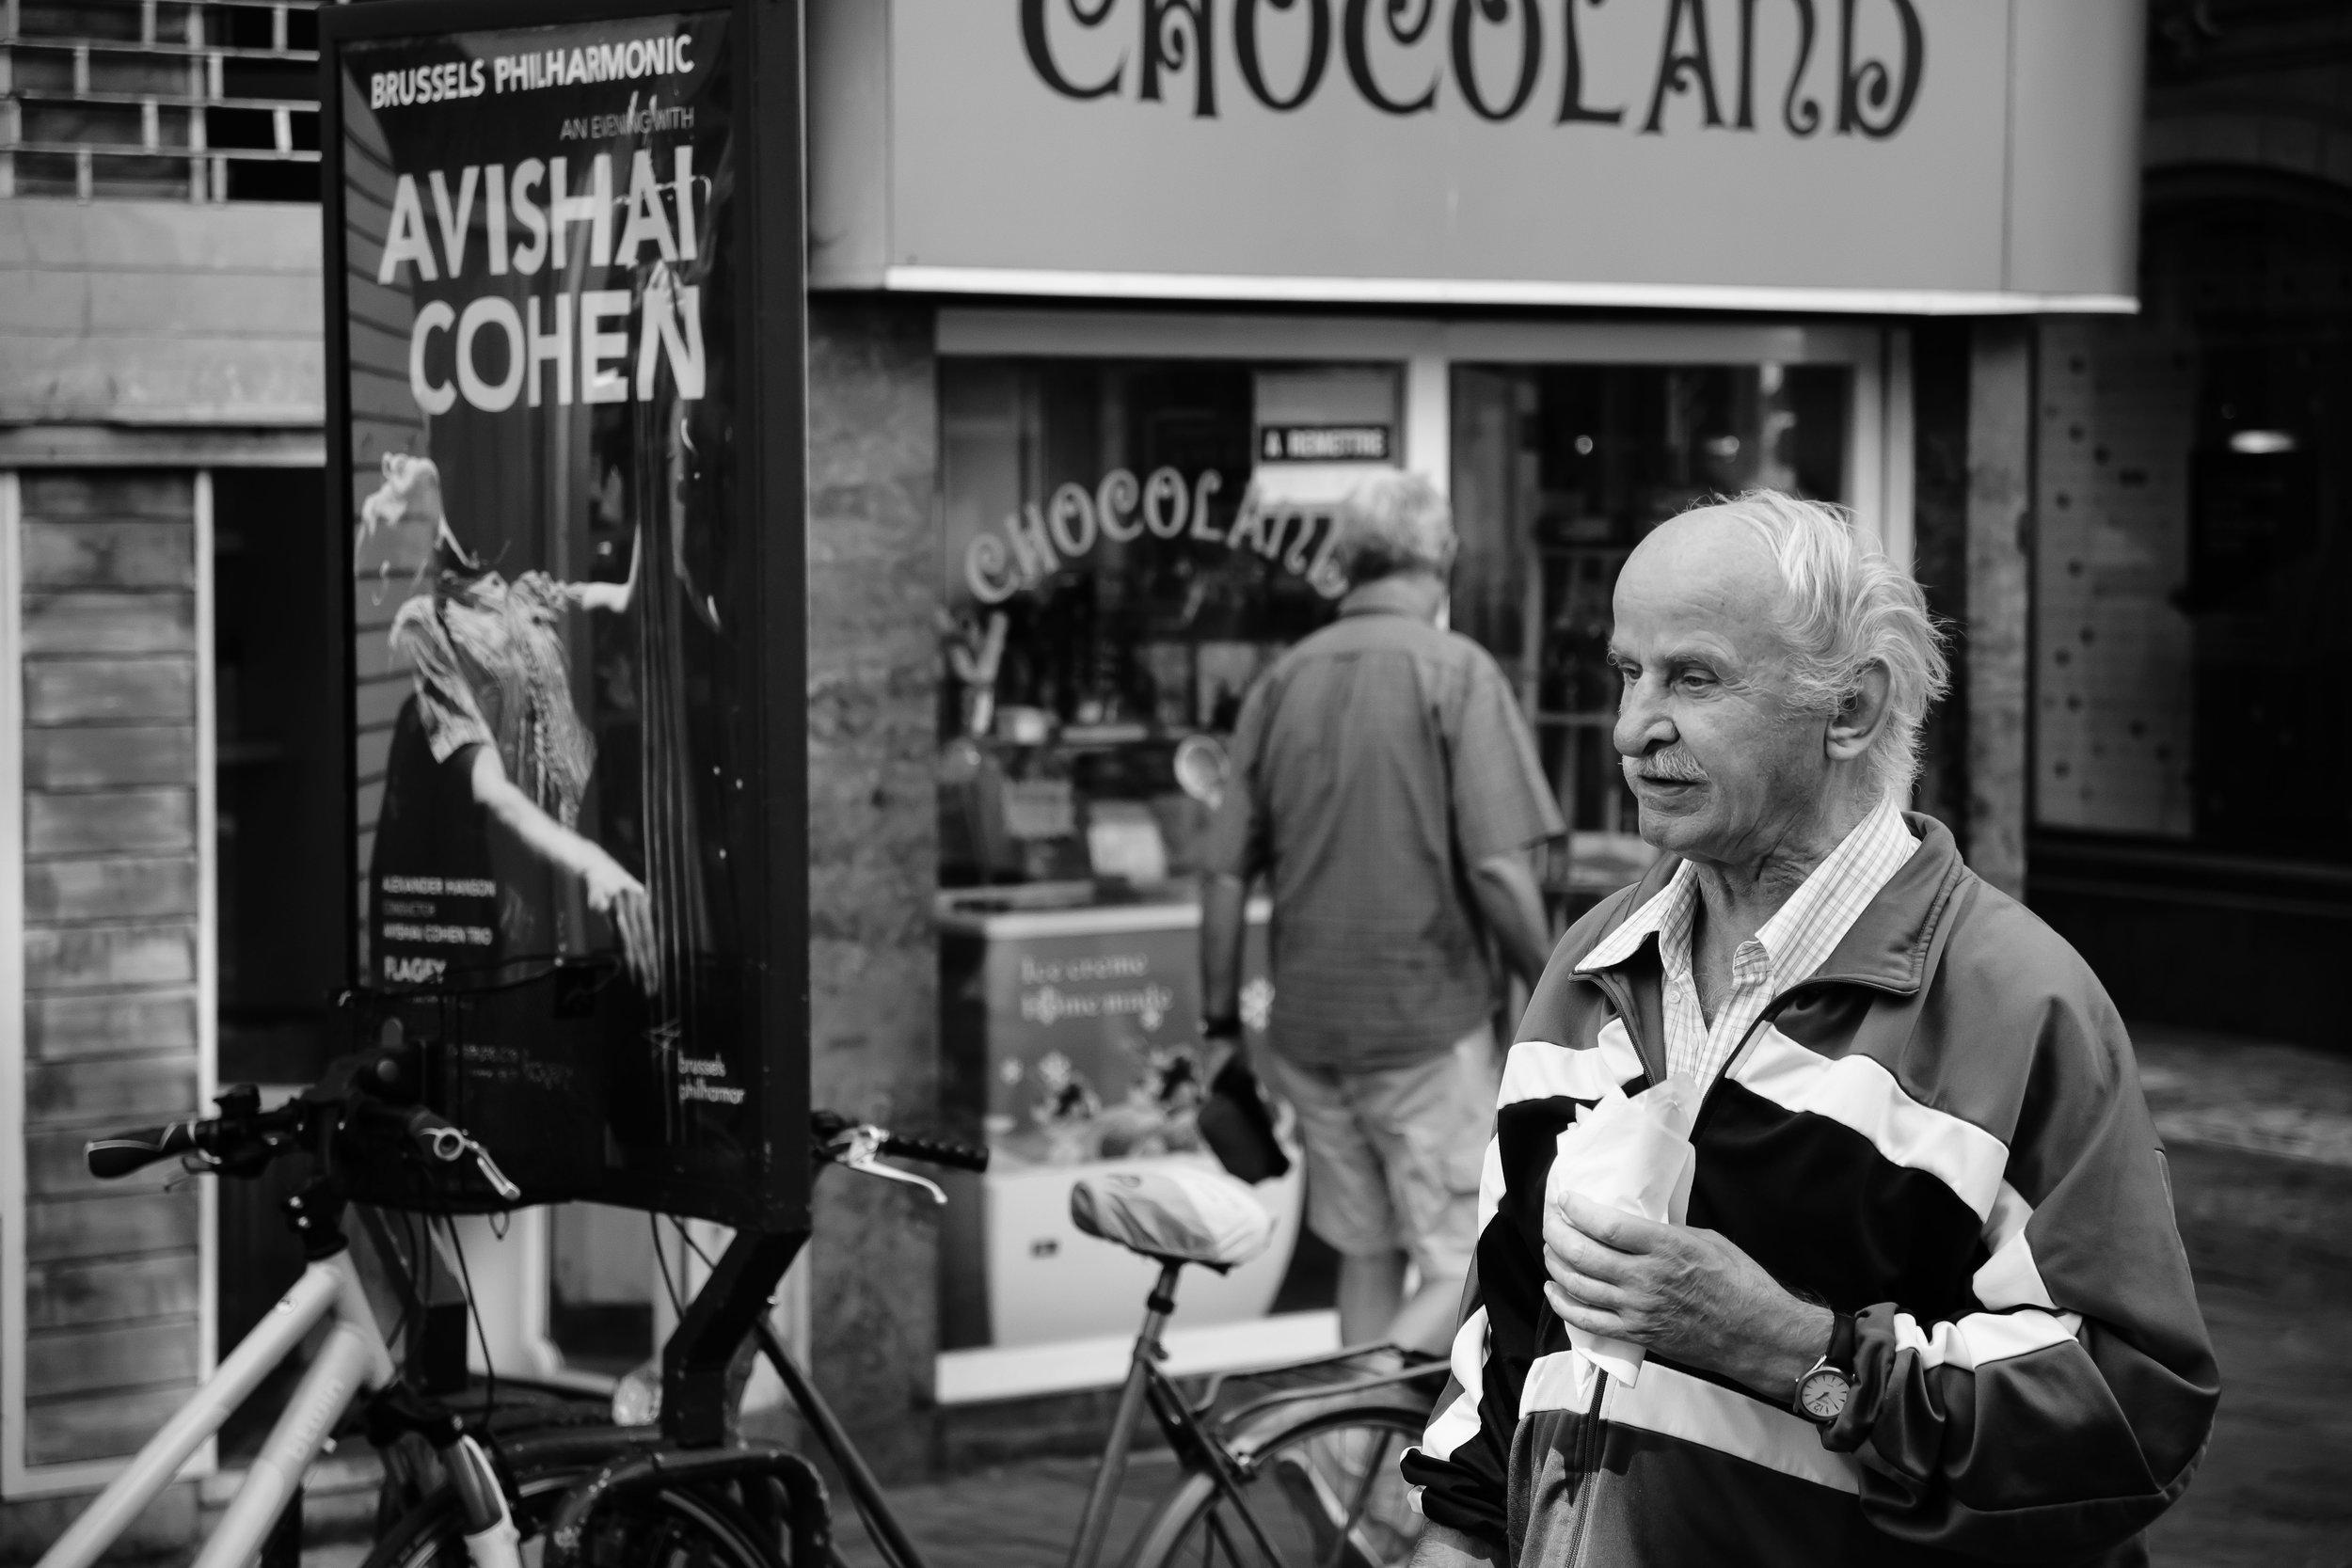 viewfinder-straatfotografie-brussel-oude-man-mijmert-droomt